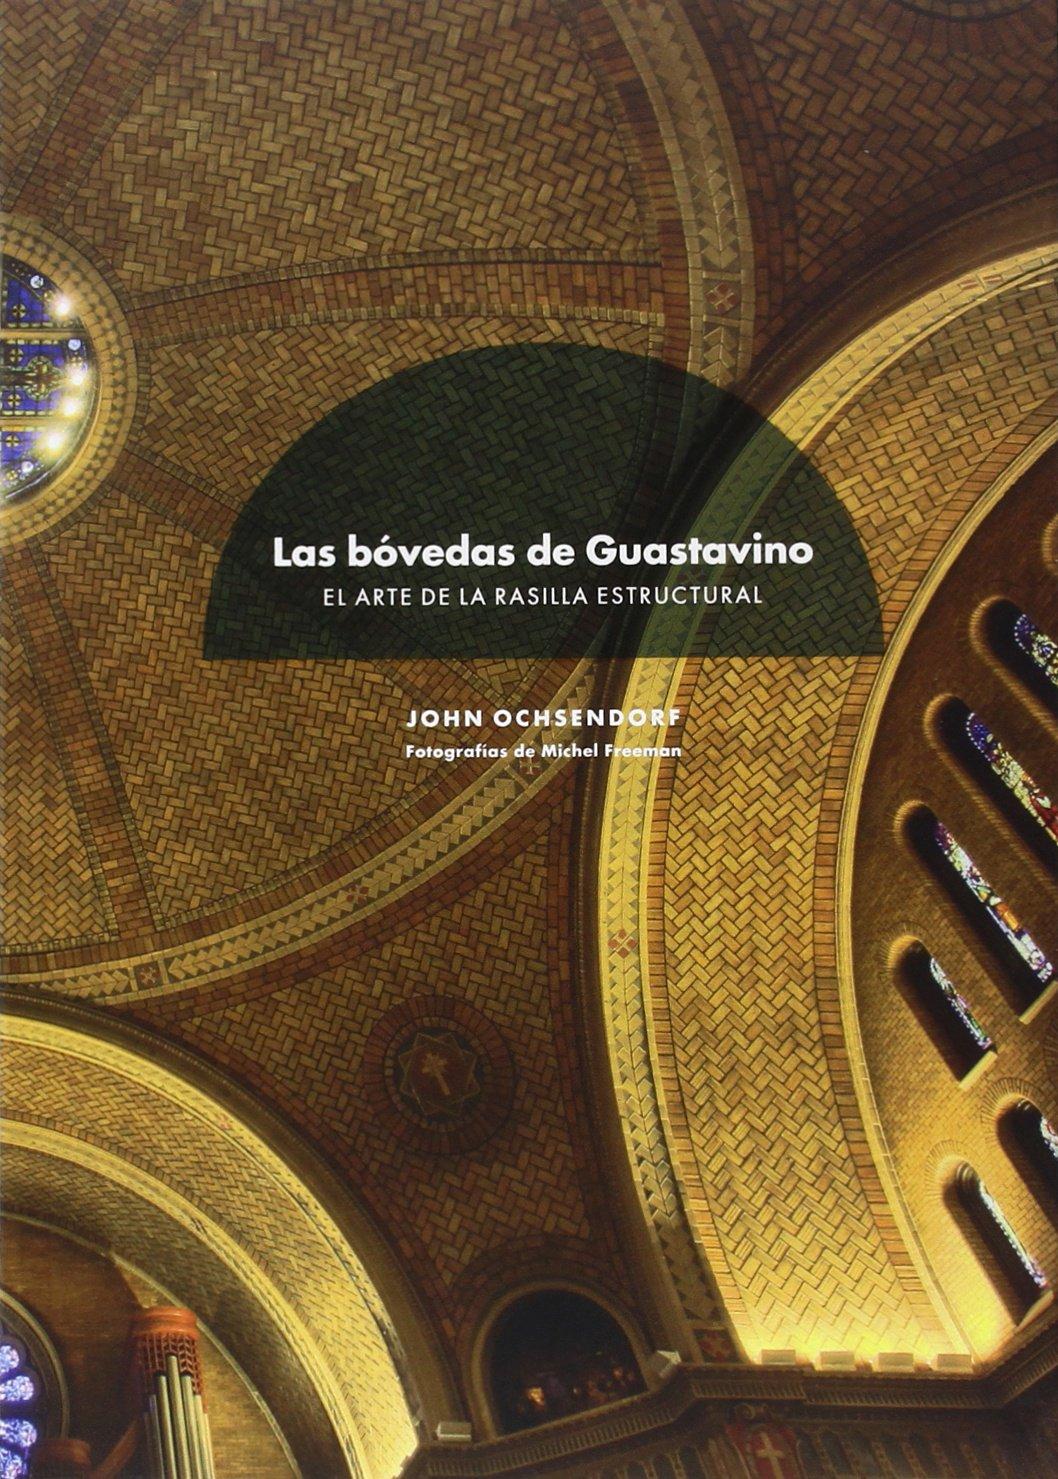 Las bóvedas de Guastavino: 1 Tapa blanda – 31 oct 2015 John Ochsendorf Ajuntament de Barcelona 8494126431 Architecture